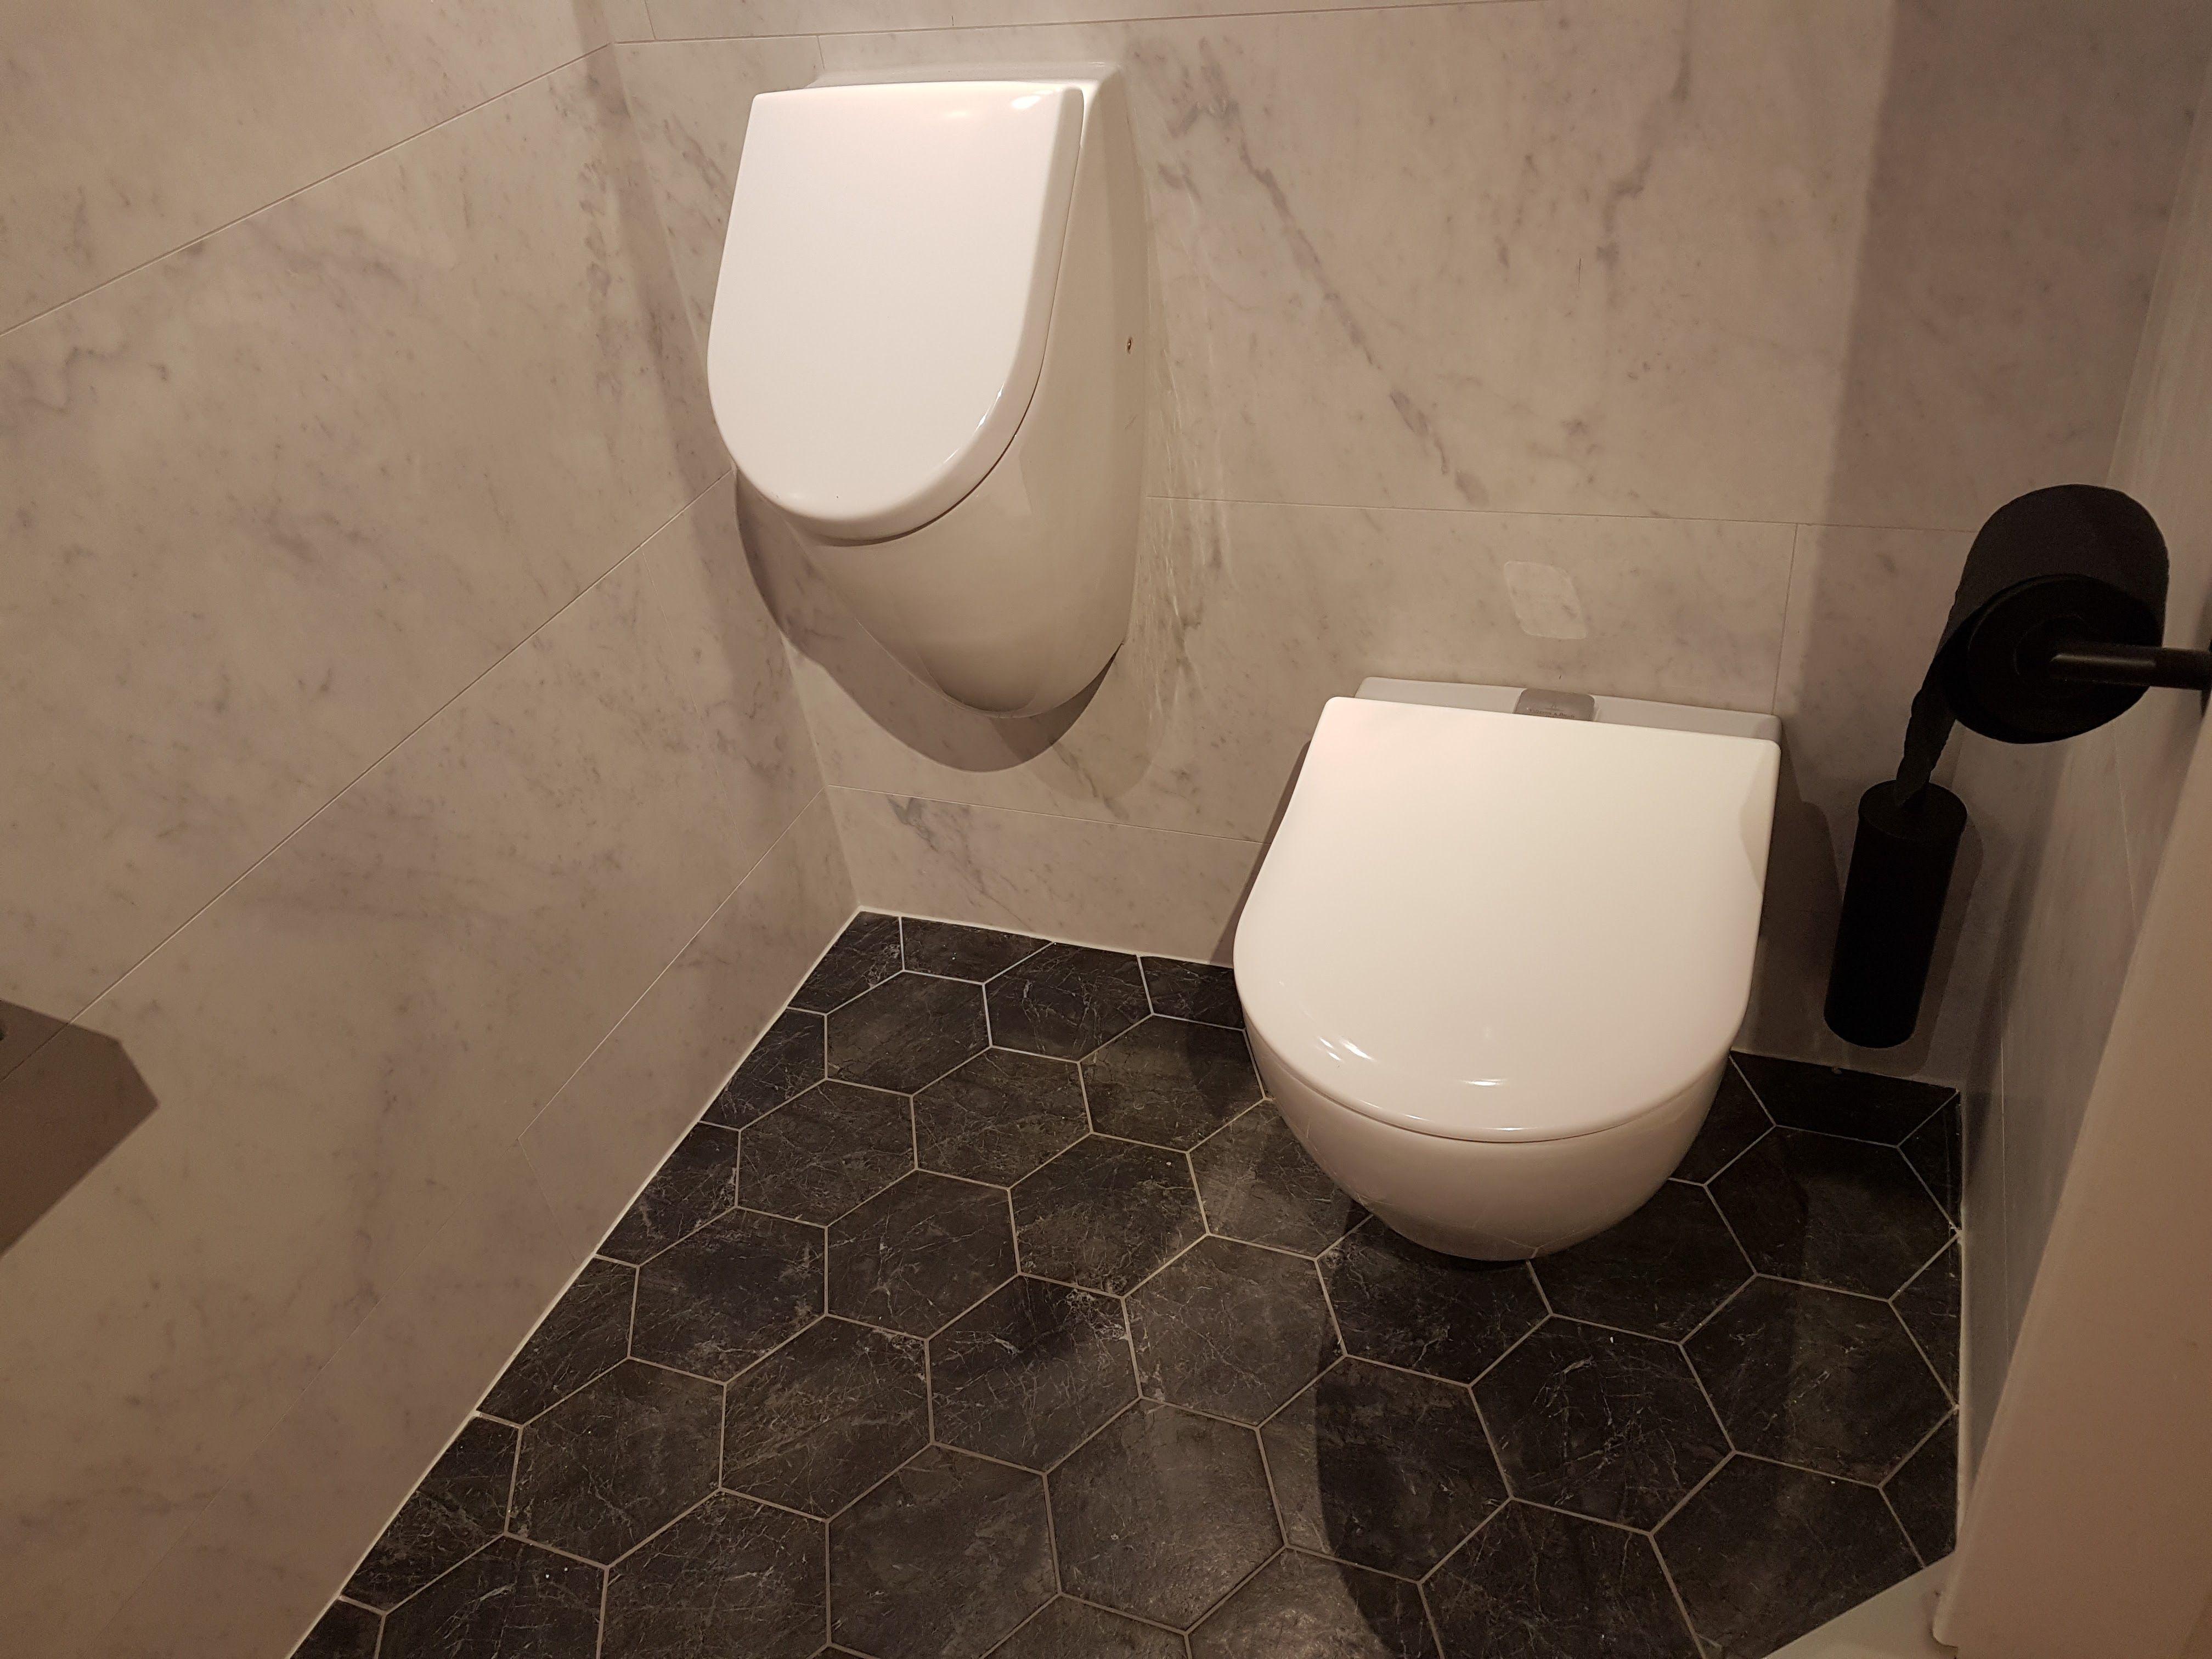 Ruimet toilet met urinoir en vifresh en urinoir van v b geen